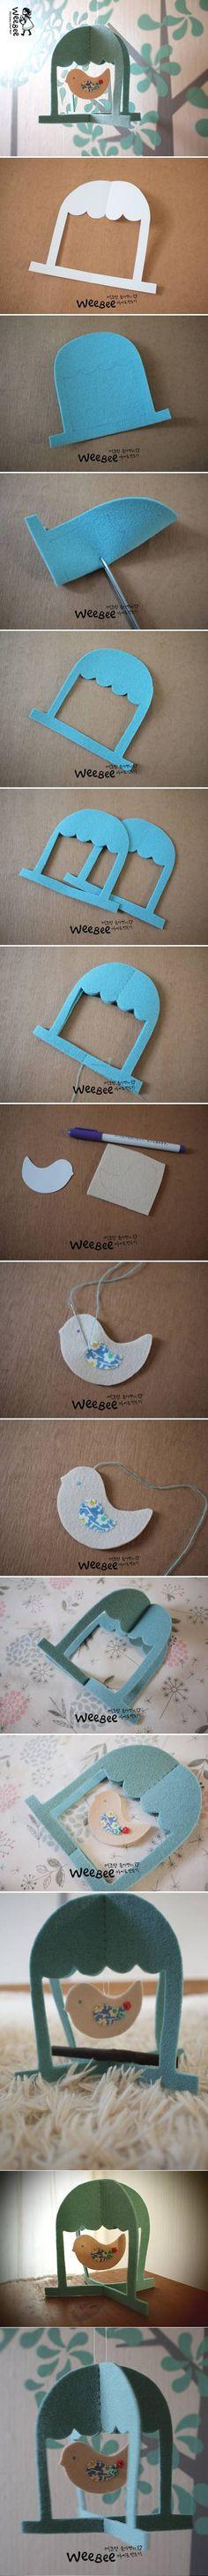 DIY Cute Felt Bird Mobile DIY Cute Felt Bird Mobile